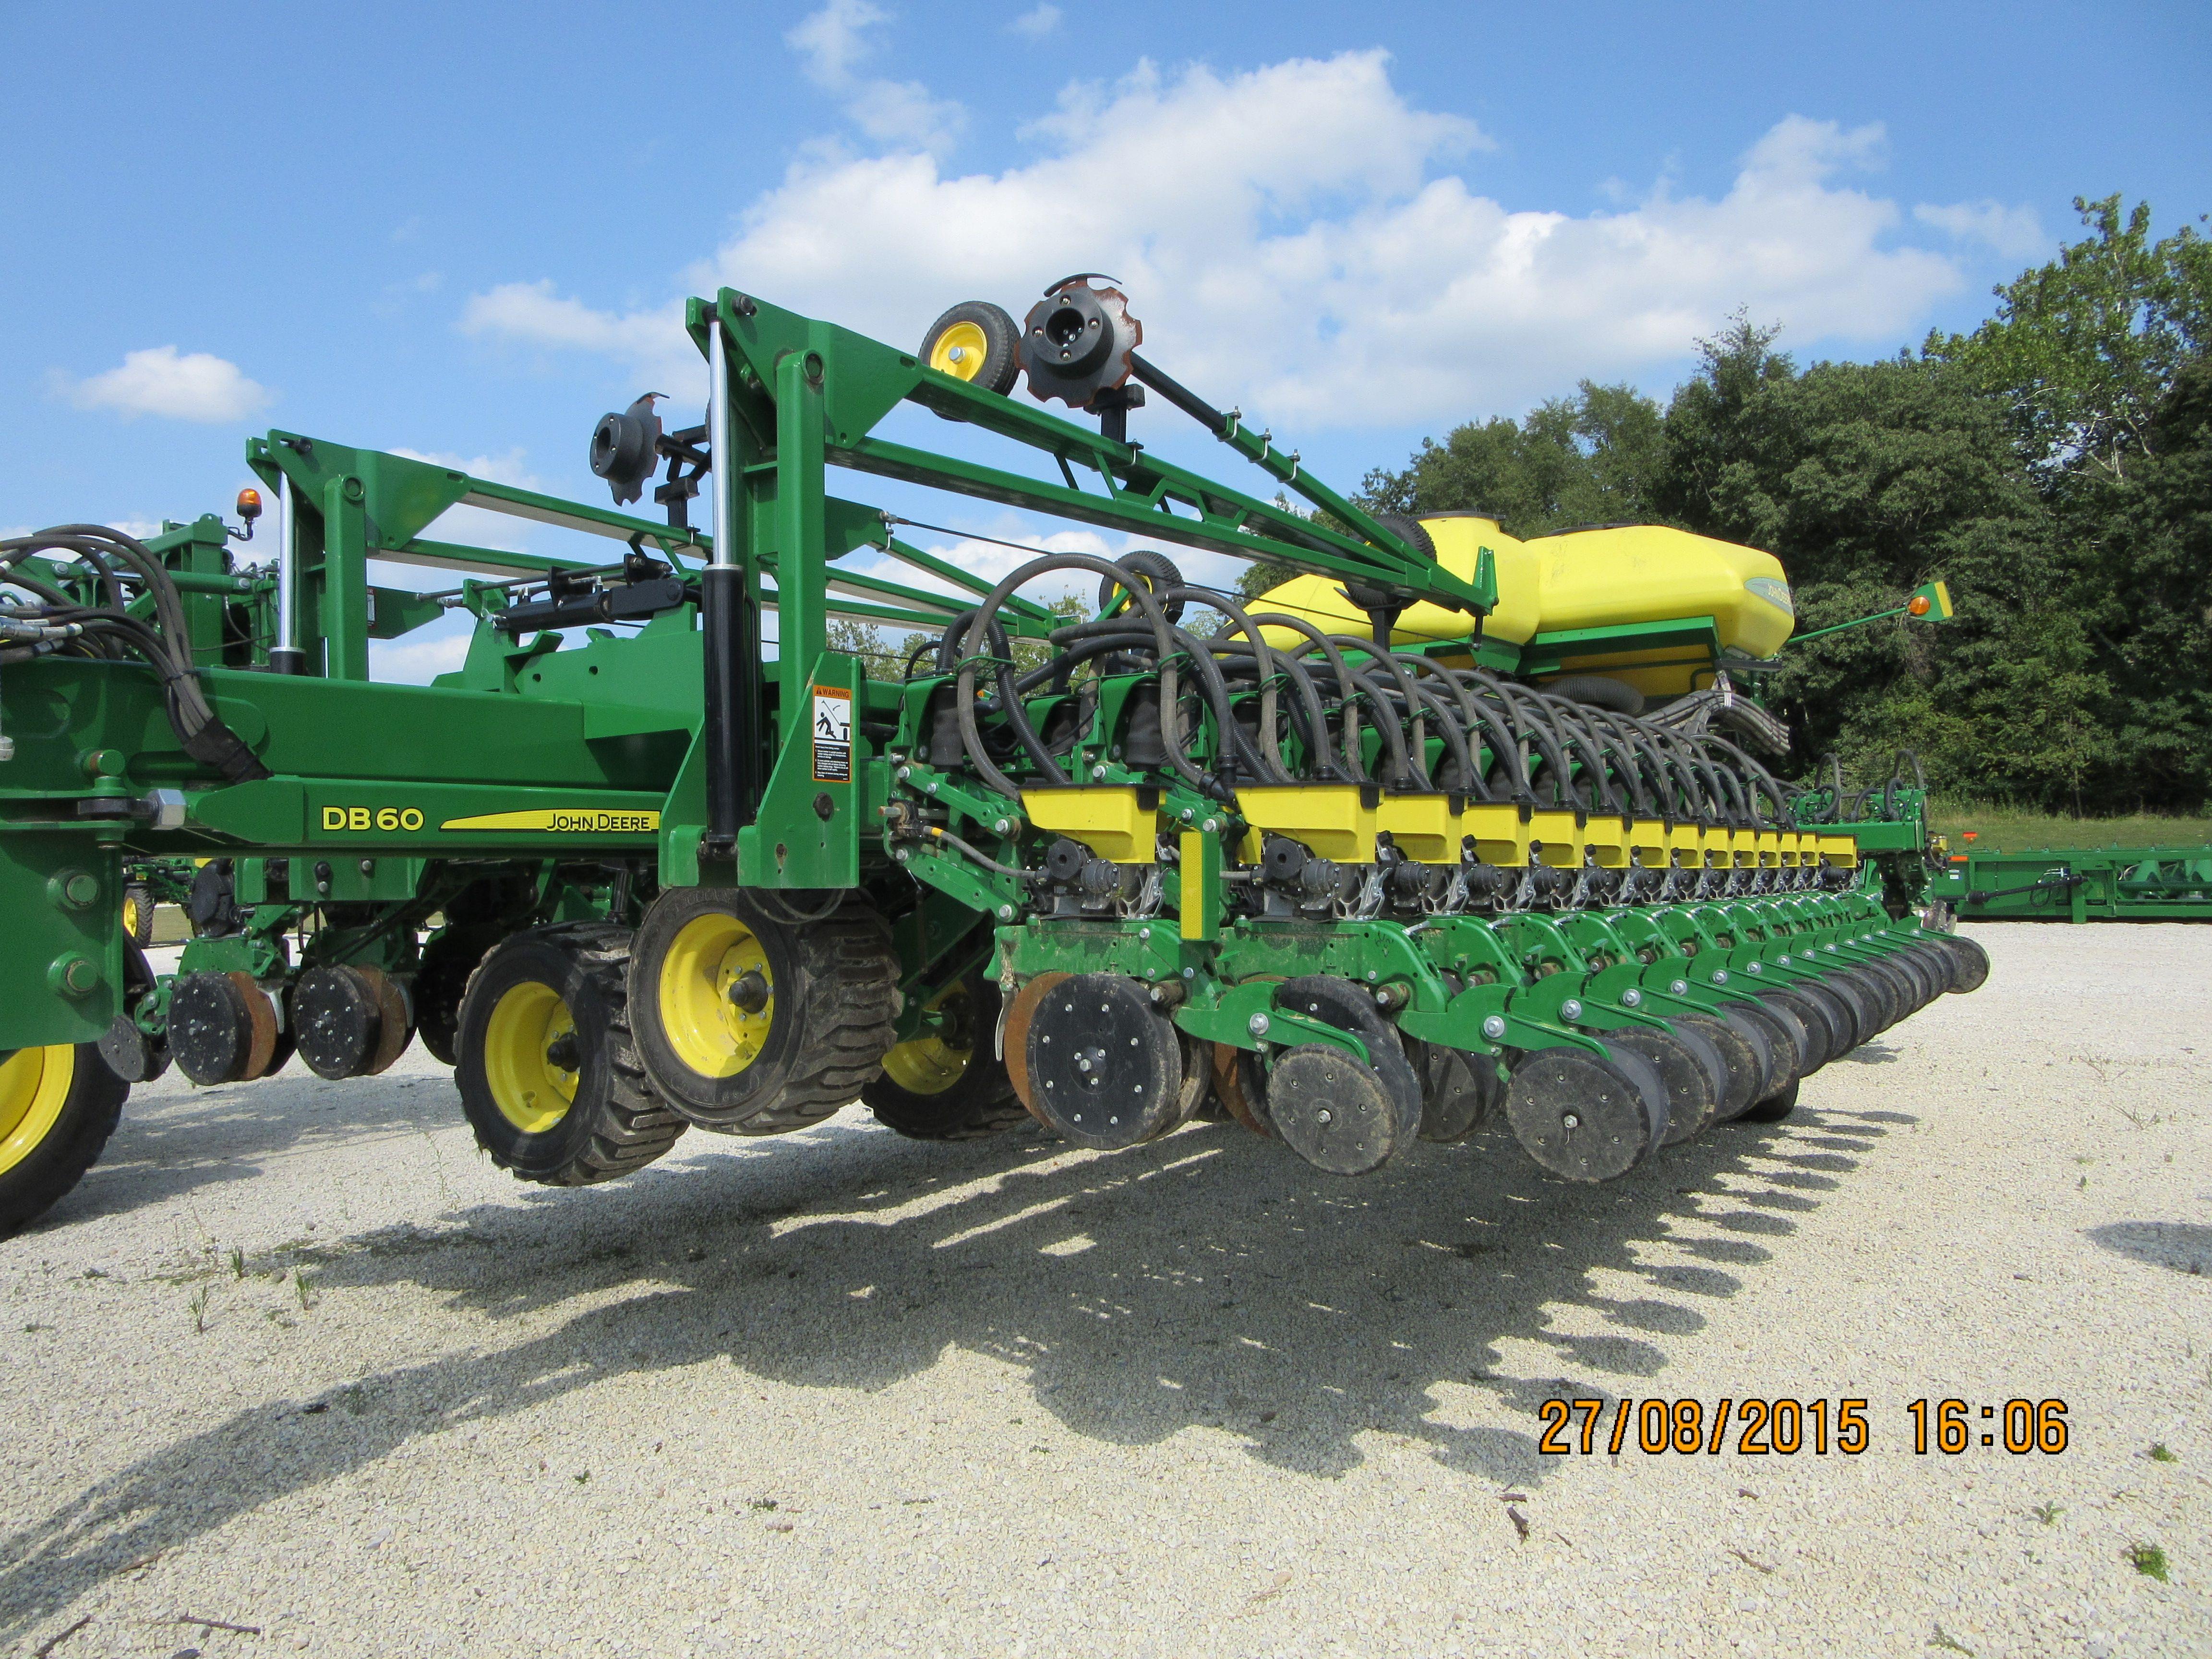 Biggest Seeder Of John Deere: 72 Row John Deere DB60 Planter